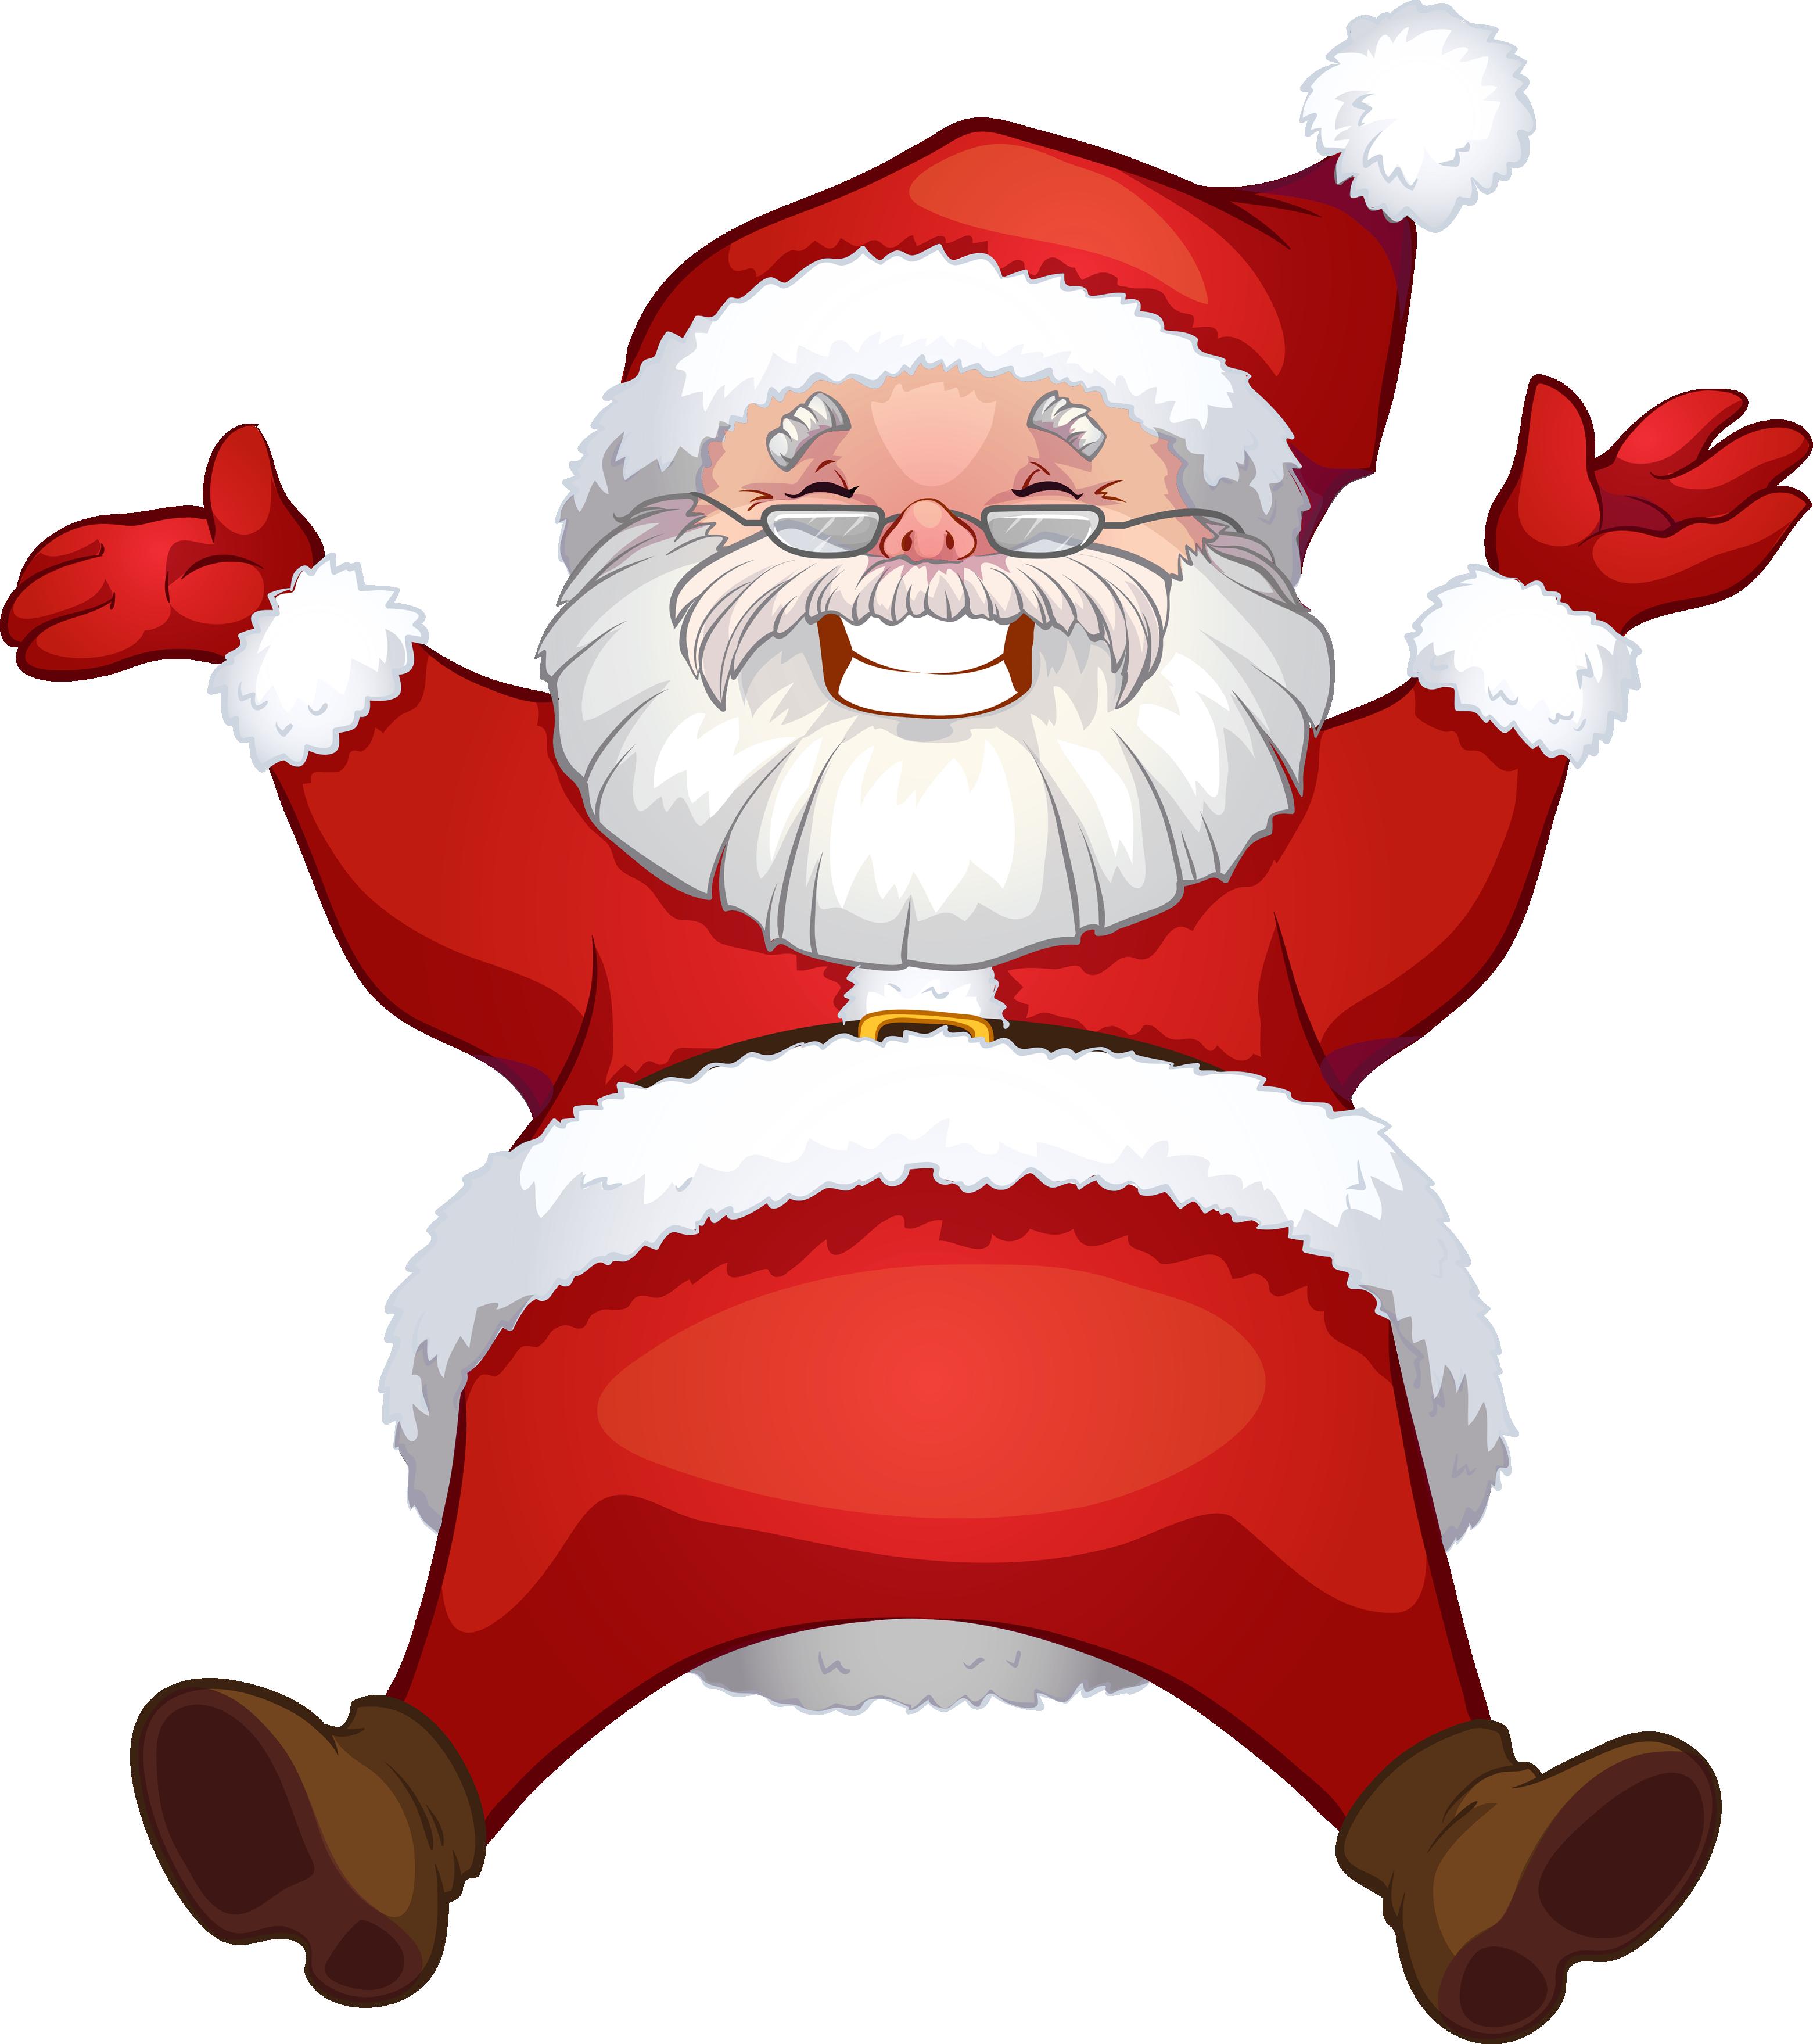 Santa Claus PNG images free download, Santa Claus PNG.